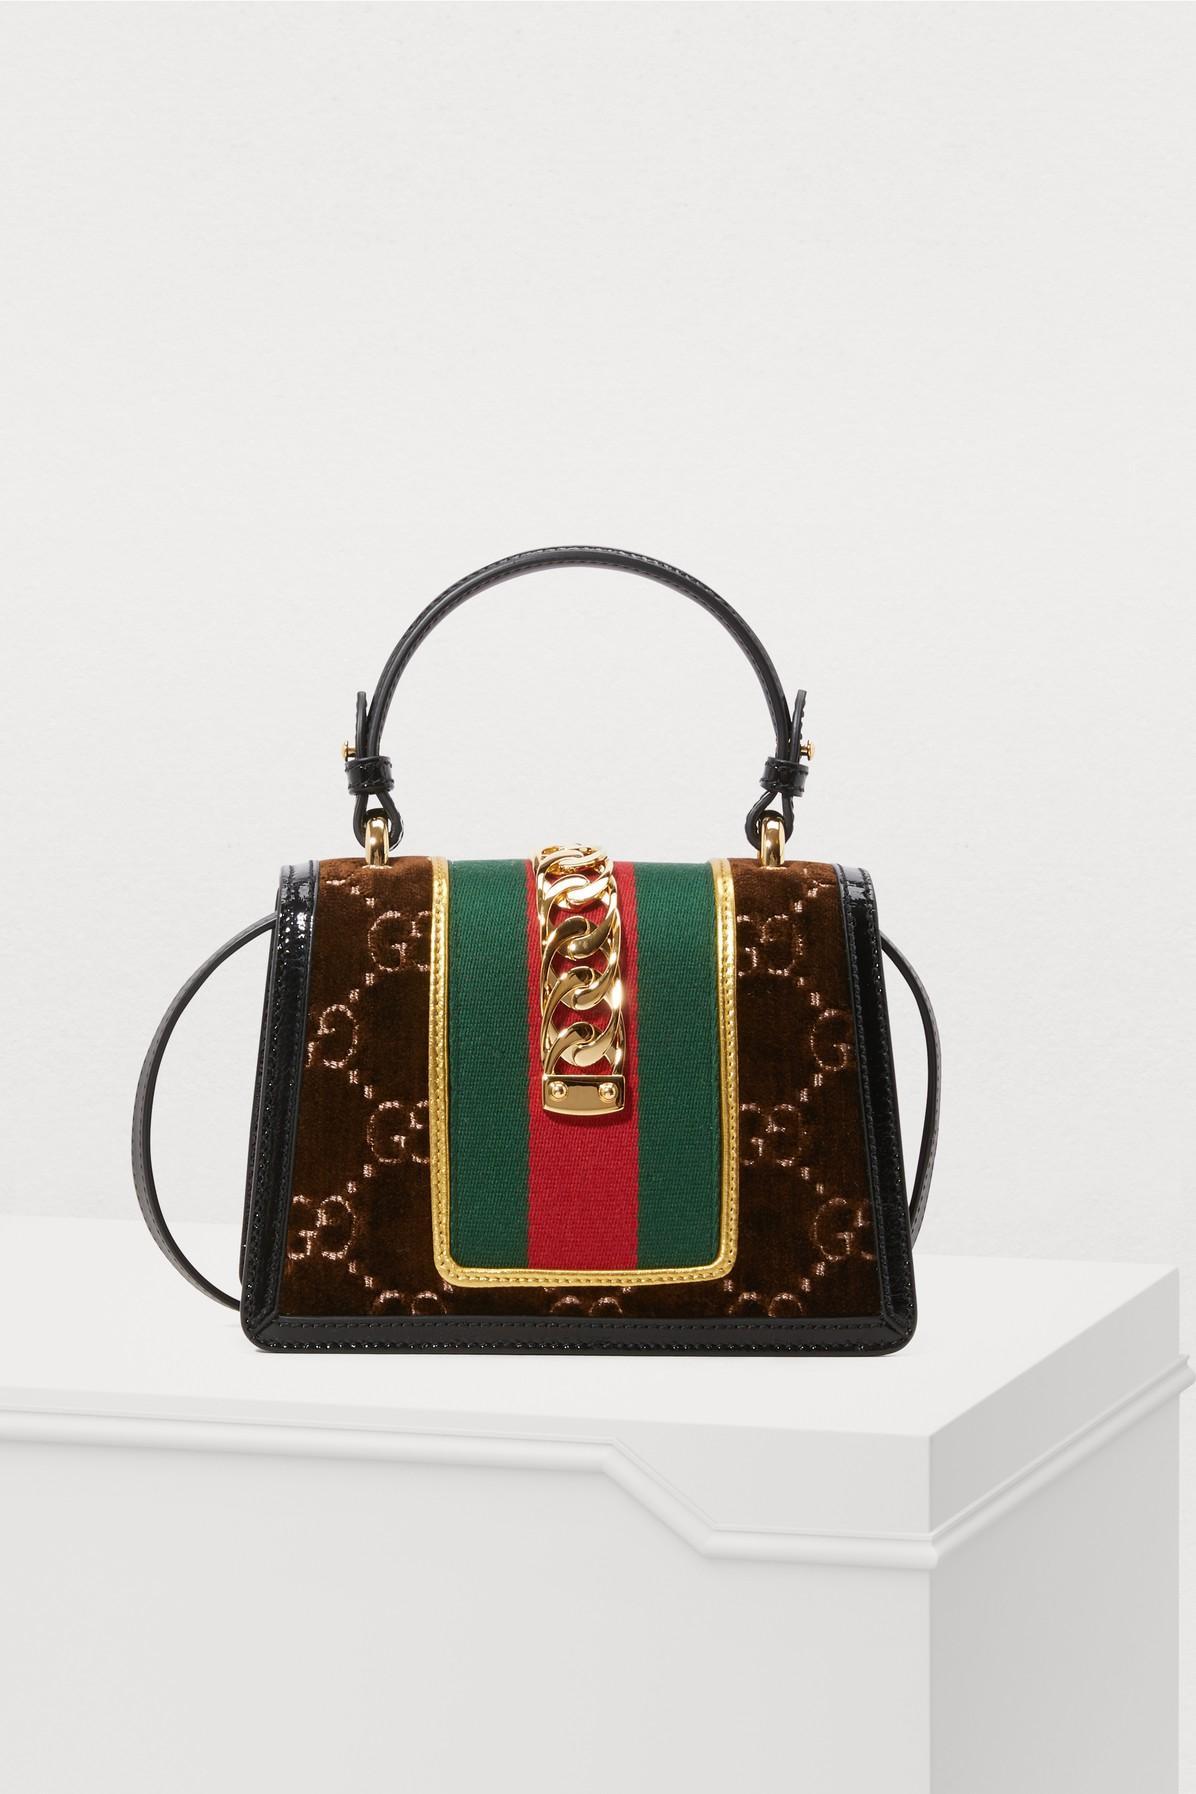 878772bac ... Brown Sylvie GG Velvet Mini Hangbag - Lyst · Visit 24S. Tap to visit  site